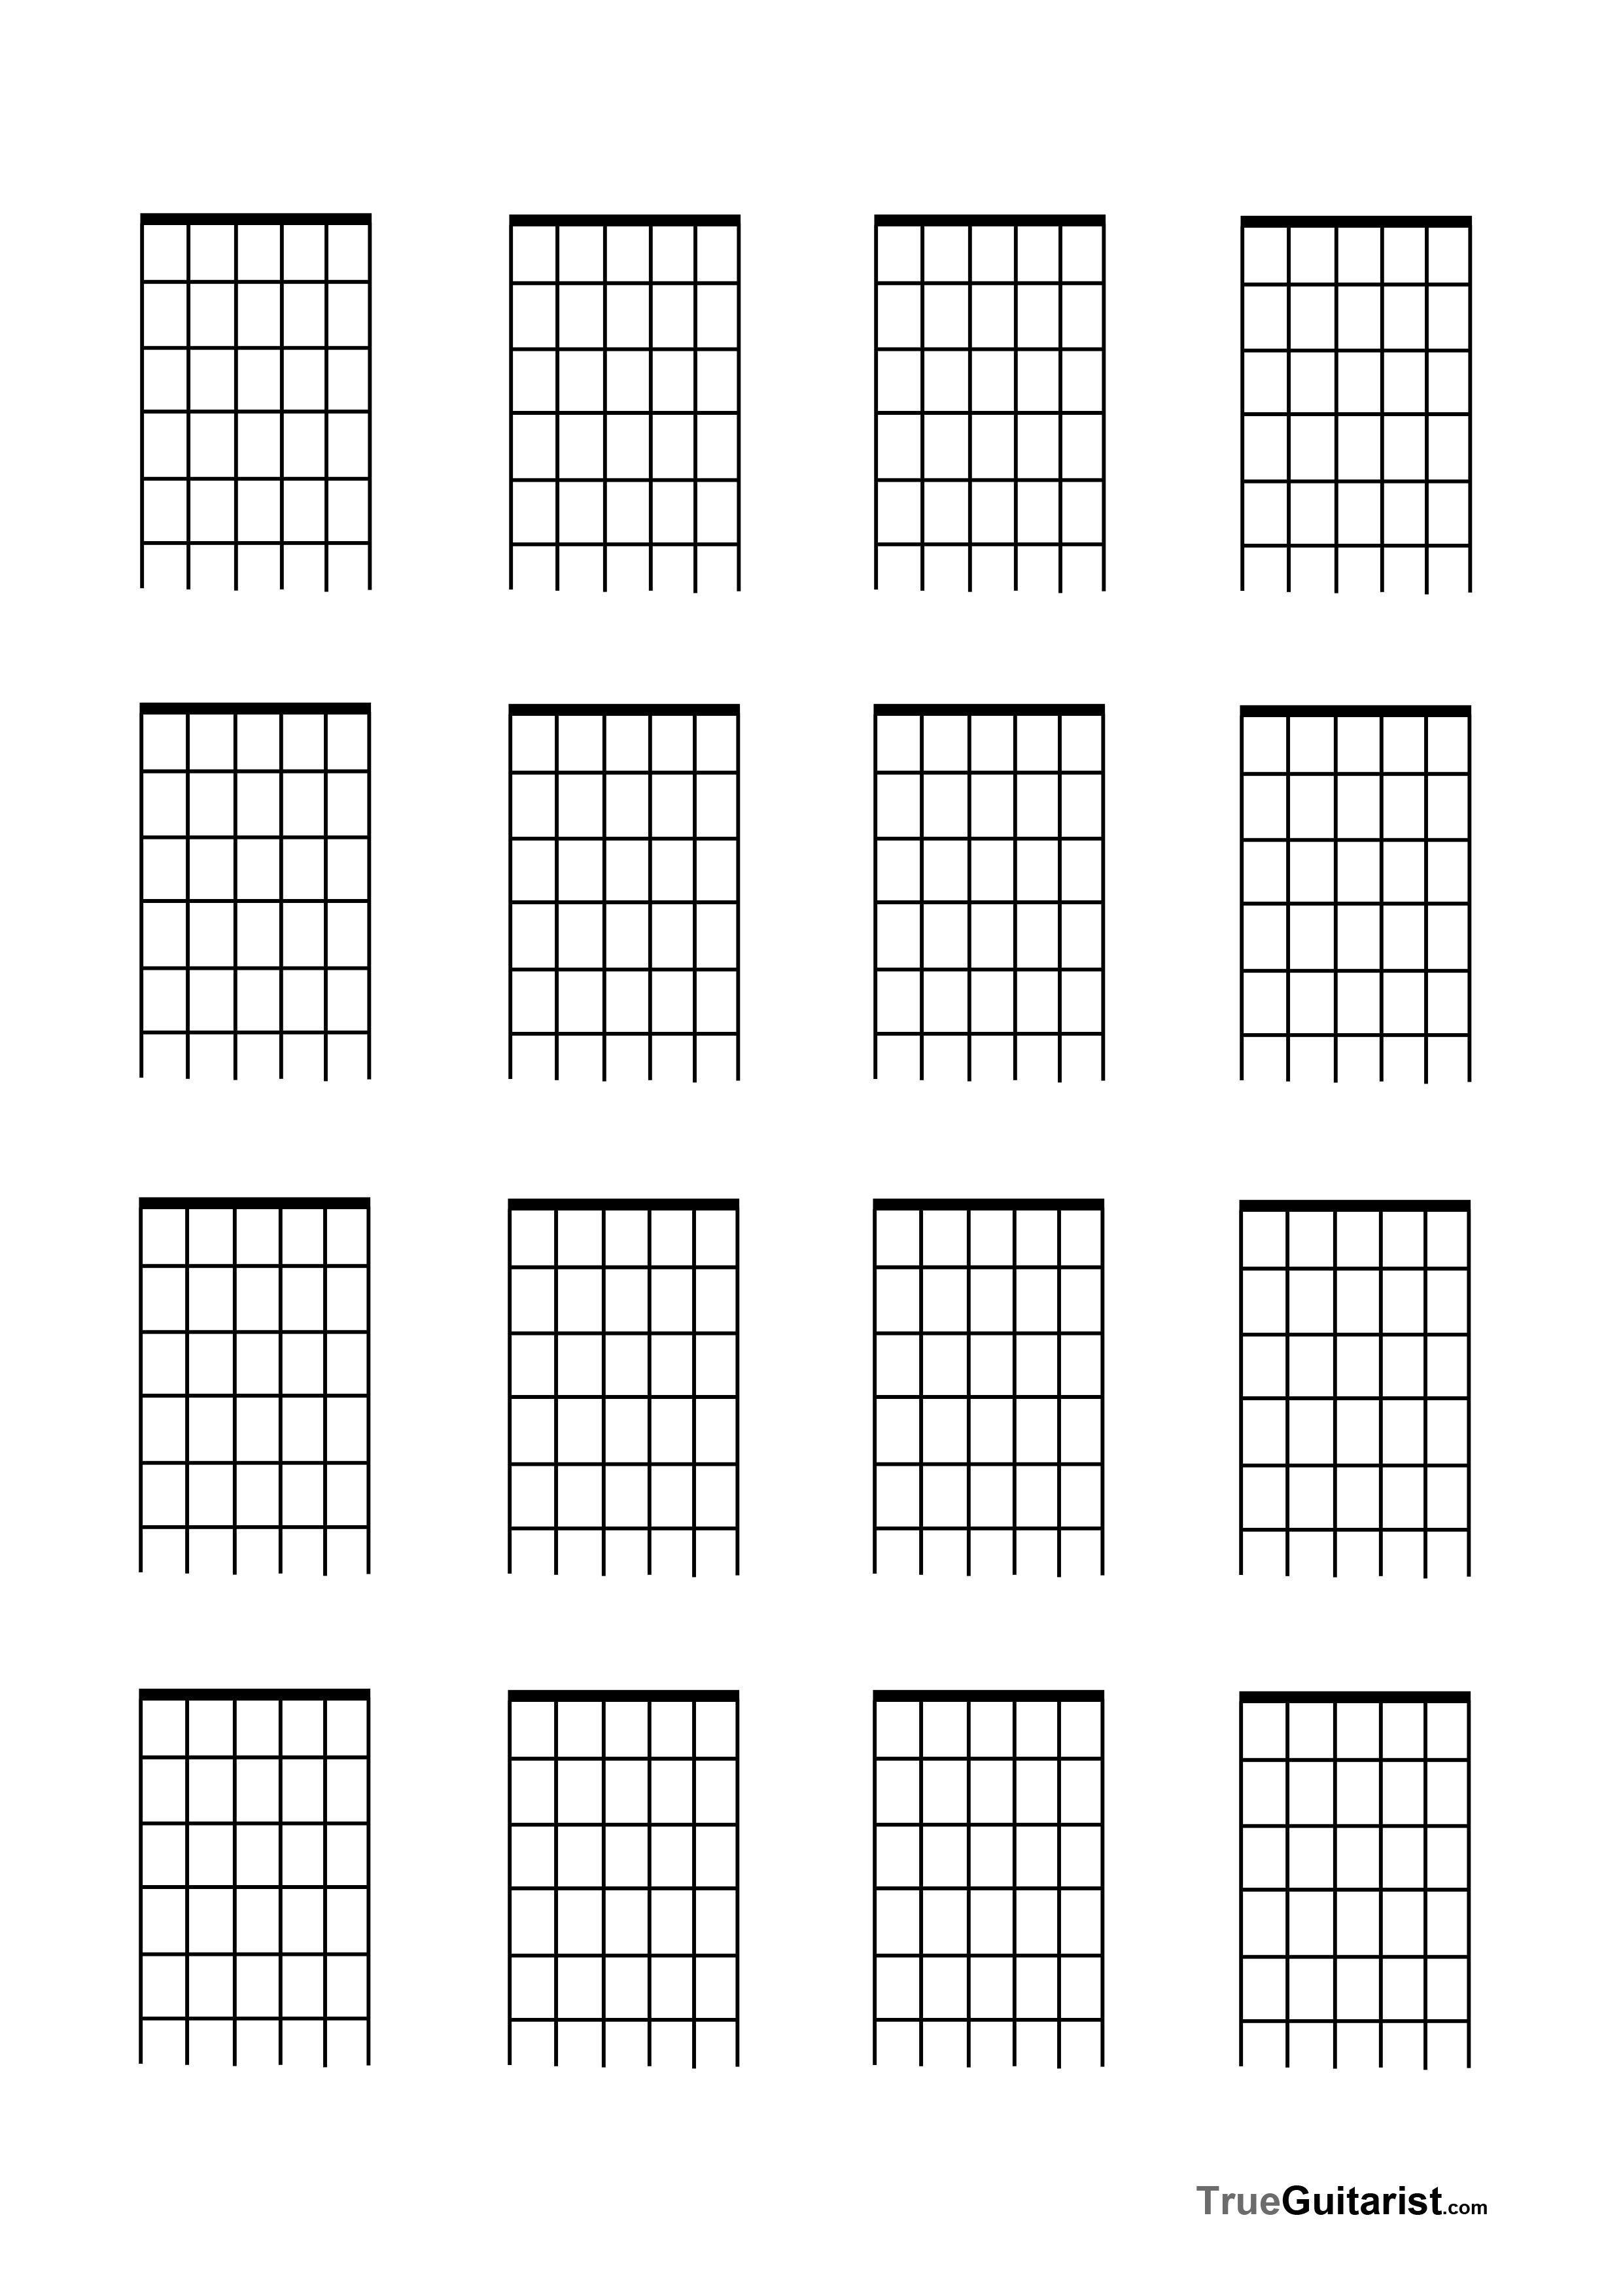 Blank Guitar Chord Chart Pin by Jessica Avery On Matt